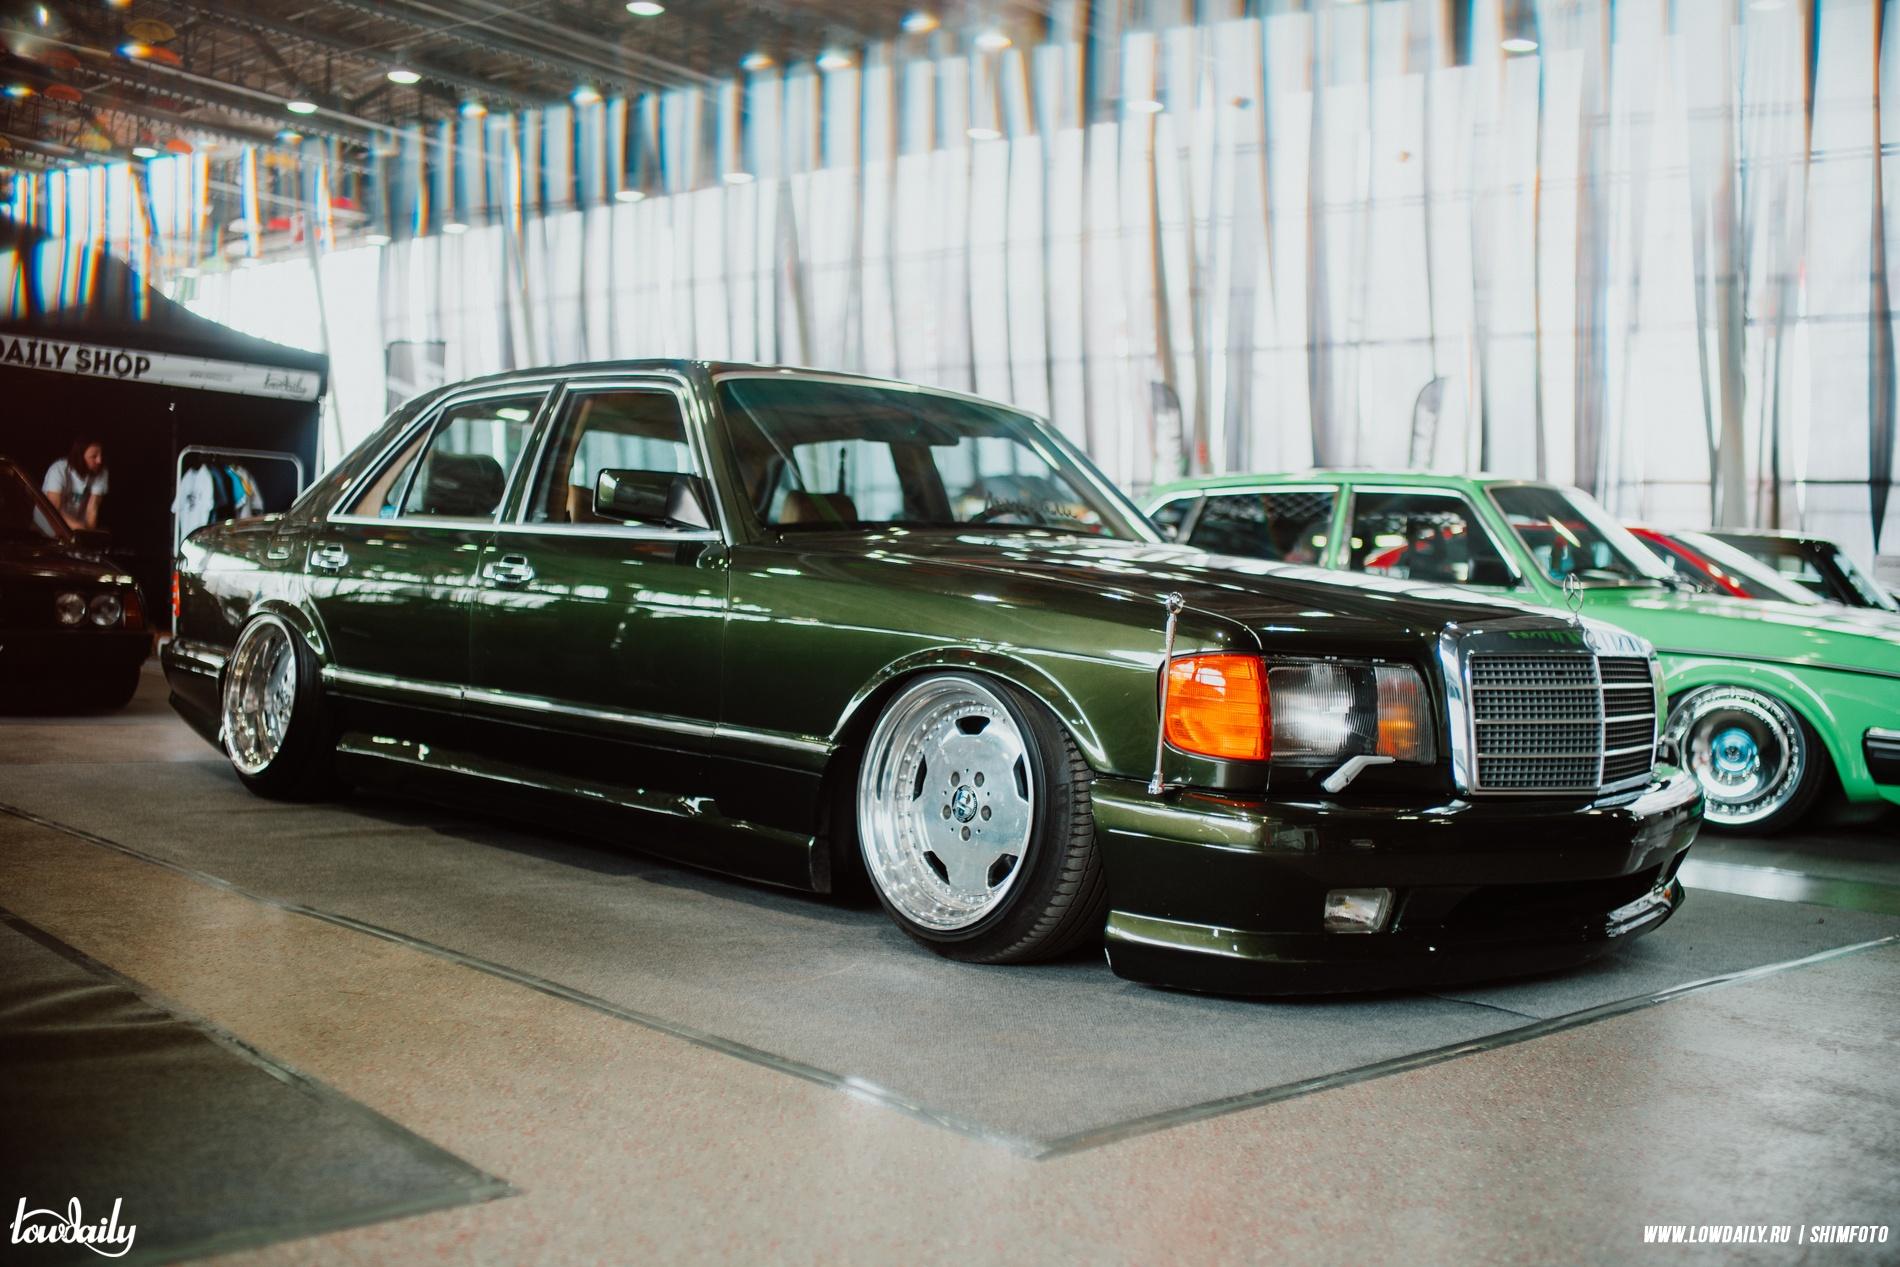 Mercedes-Benz W126 5.6 V8